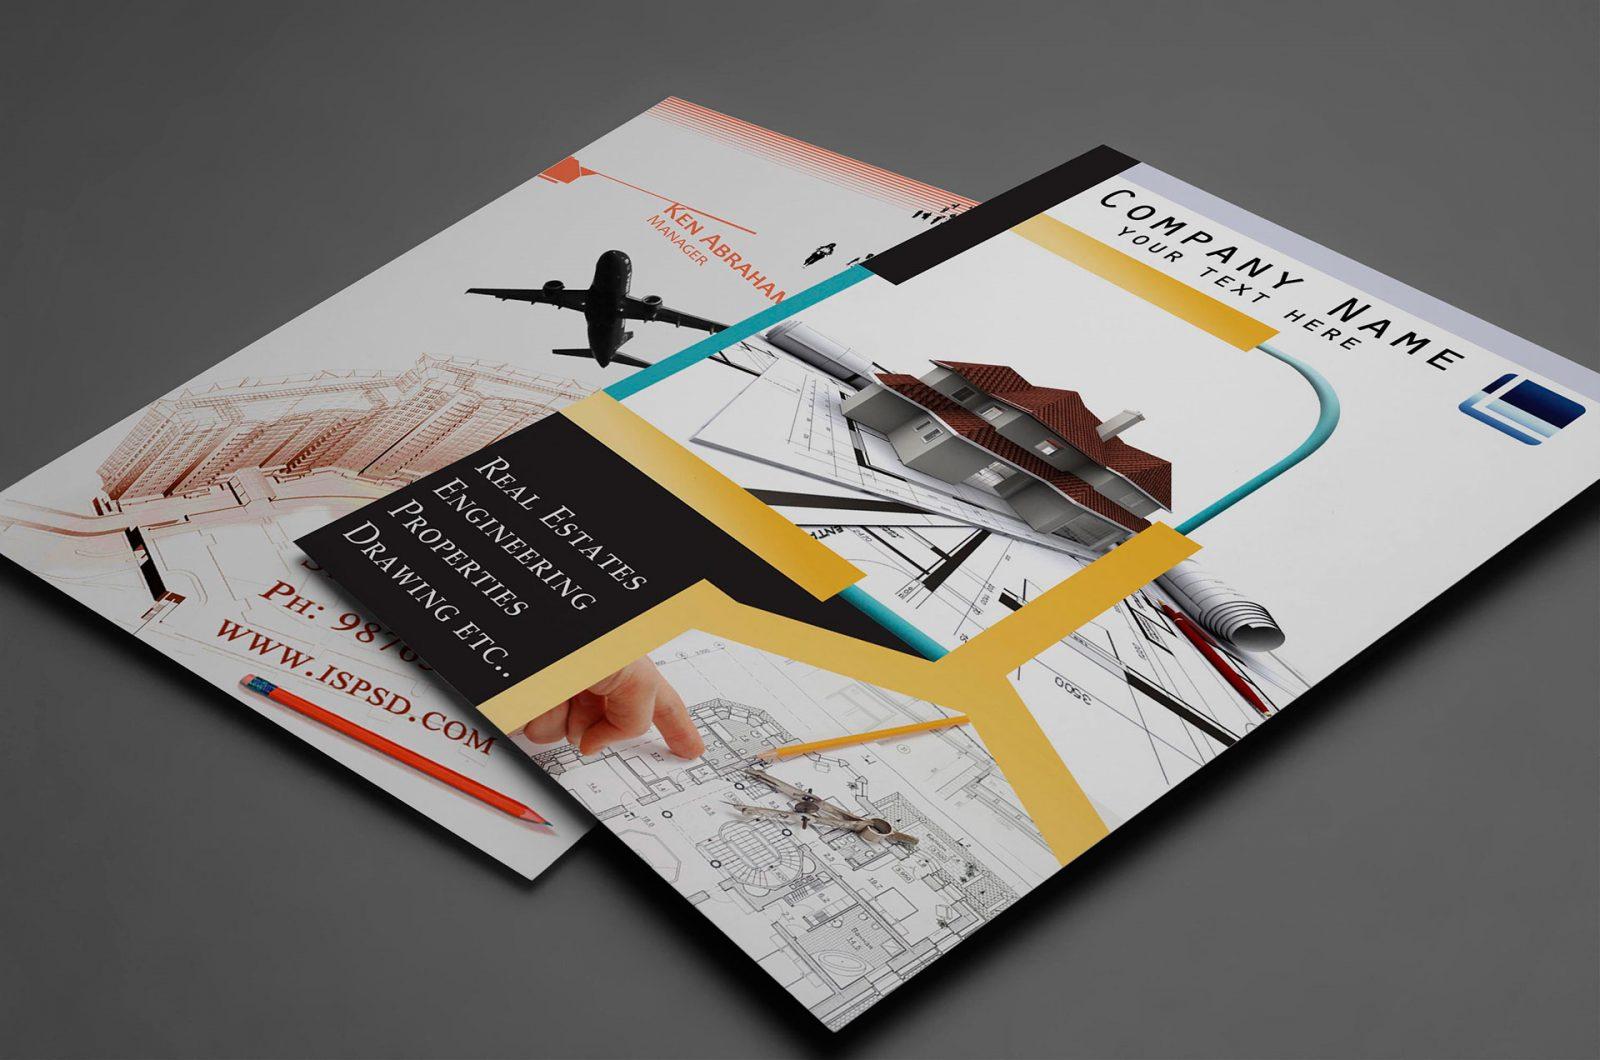 catalogue bg 1600x1060 - Thiết kế catalogue